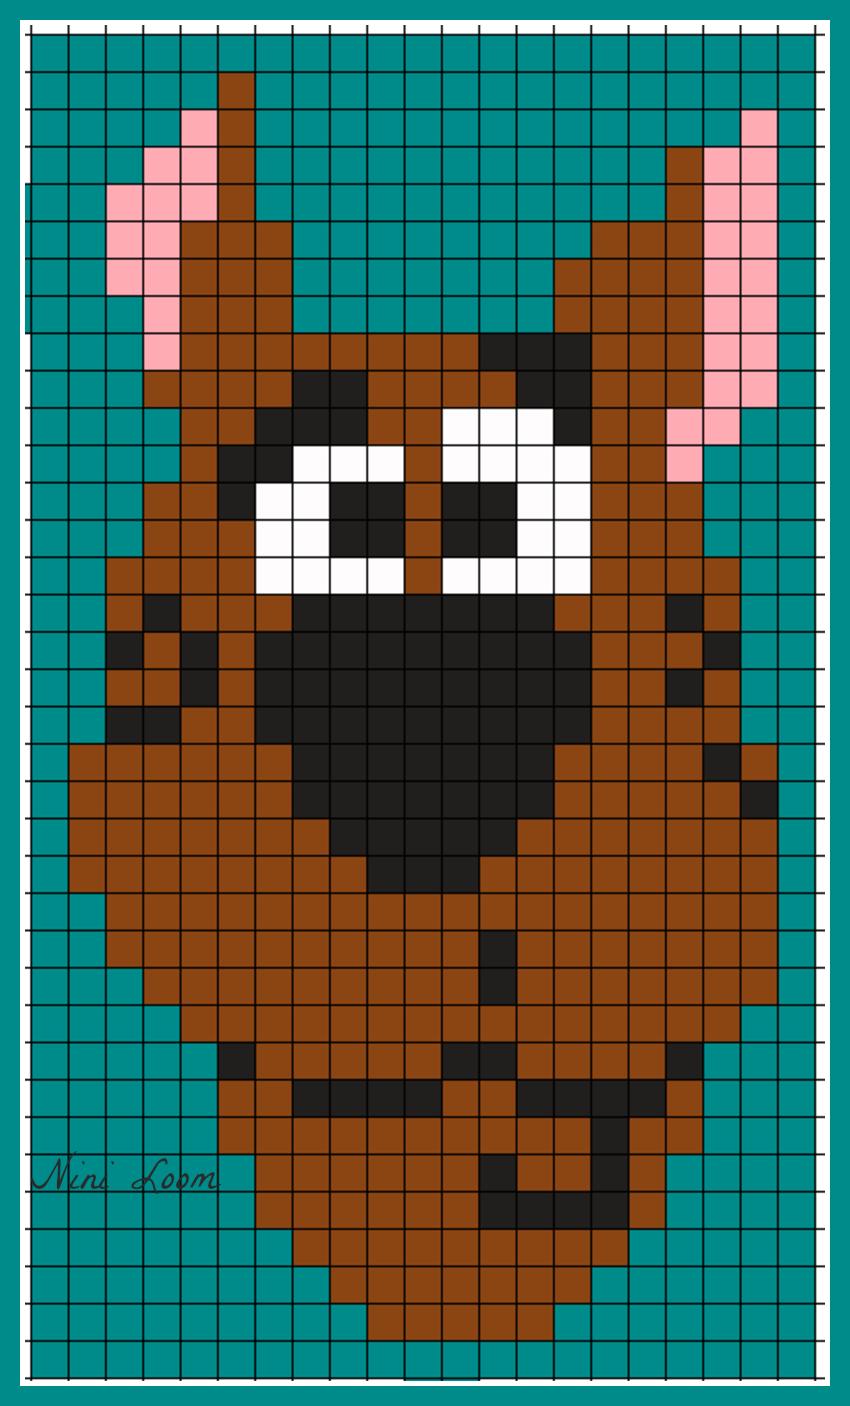 Image Du Blog Loomscenterblognet Dessin Pixel Pixel Art